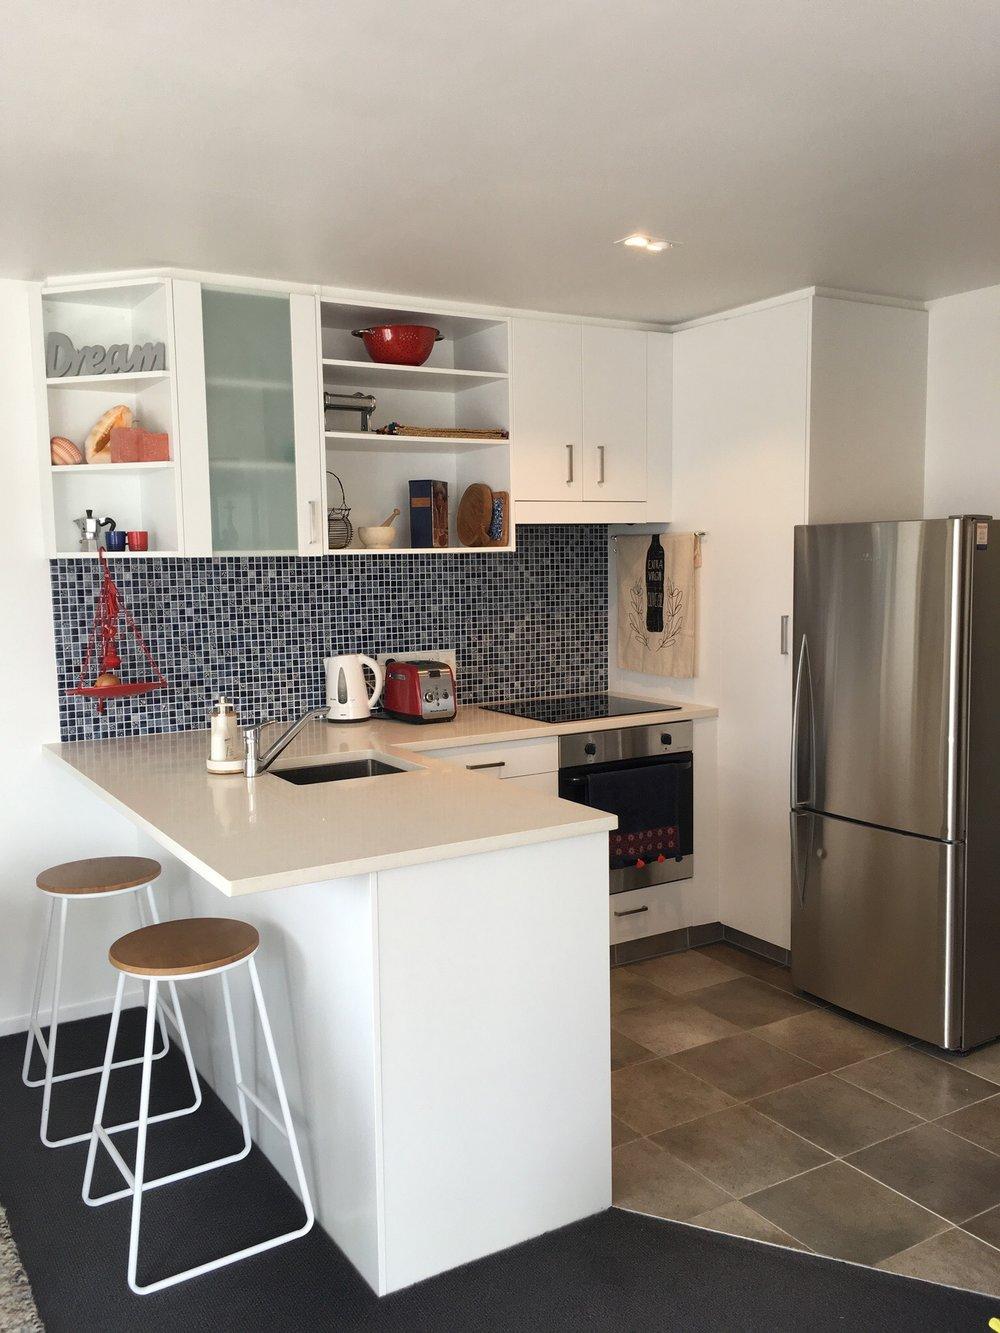 SA508 Kitchen IMG_5330.jpeg